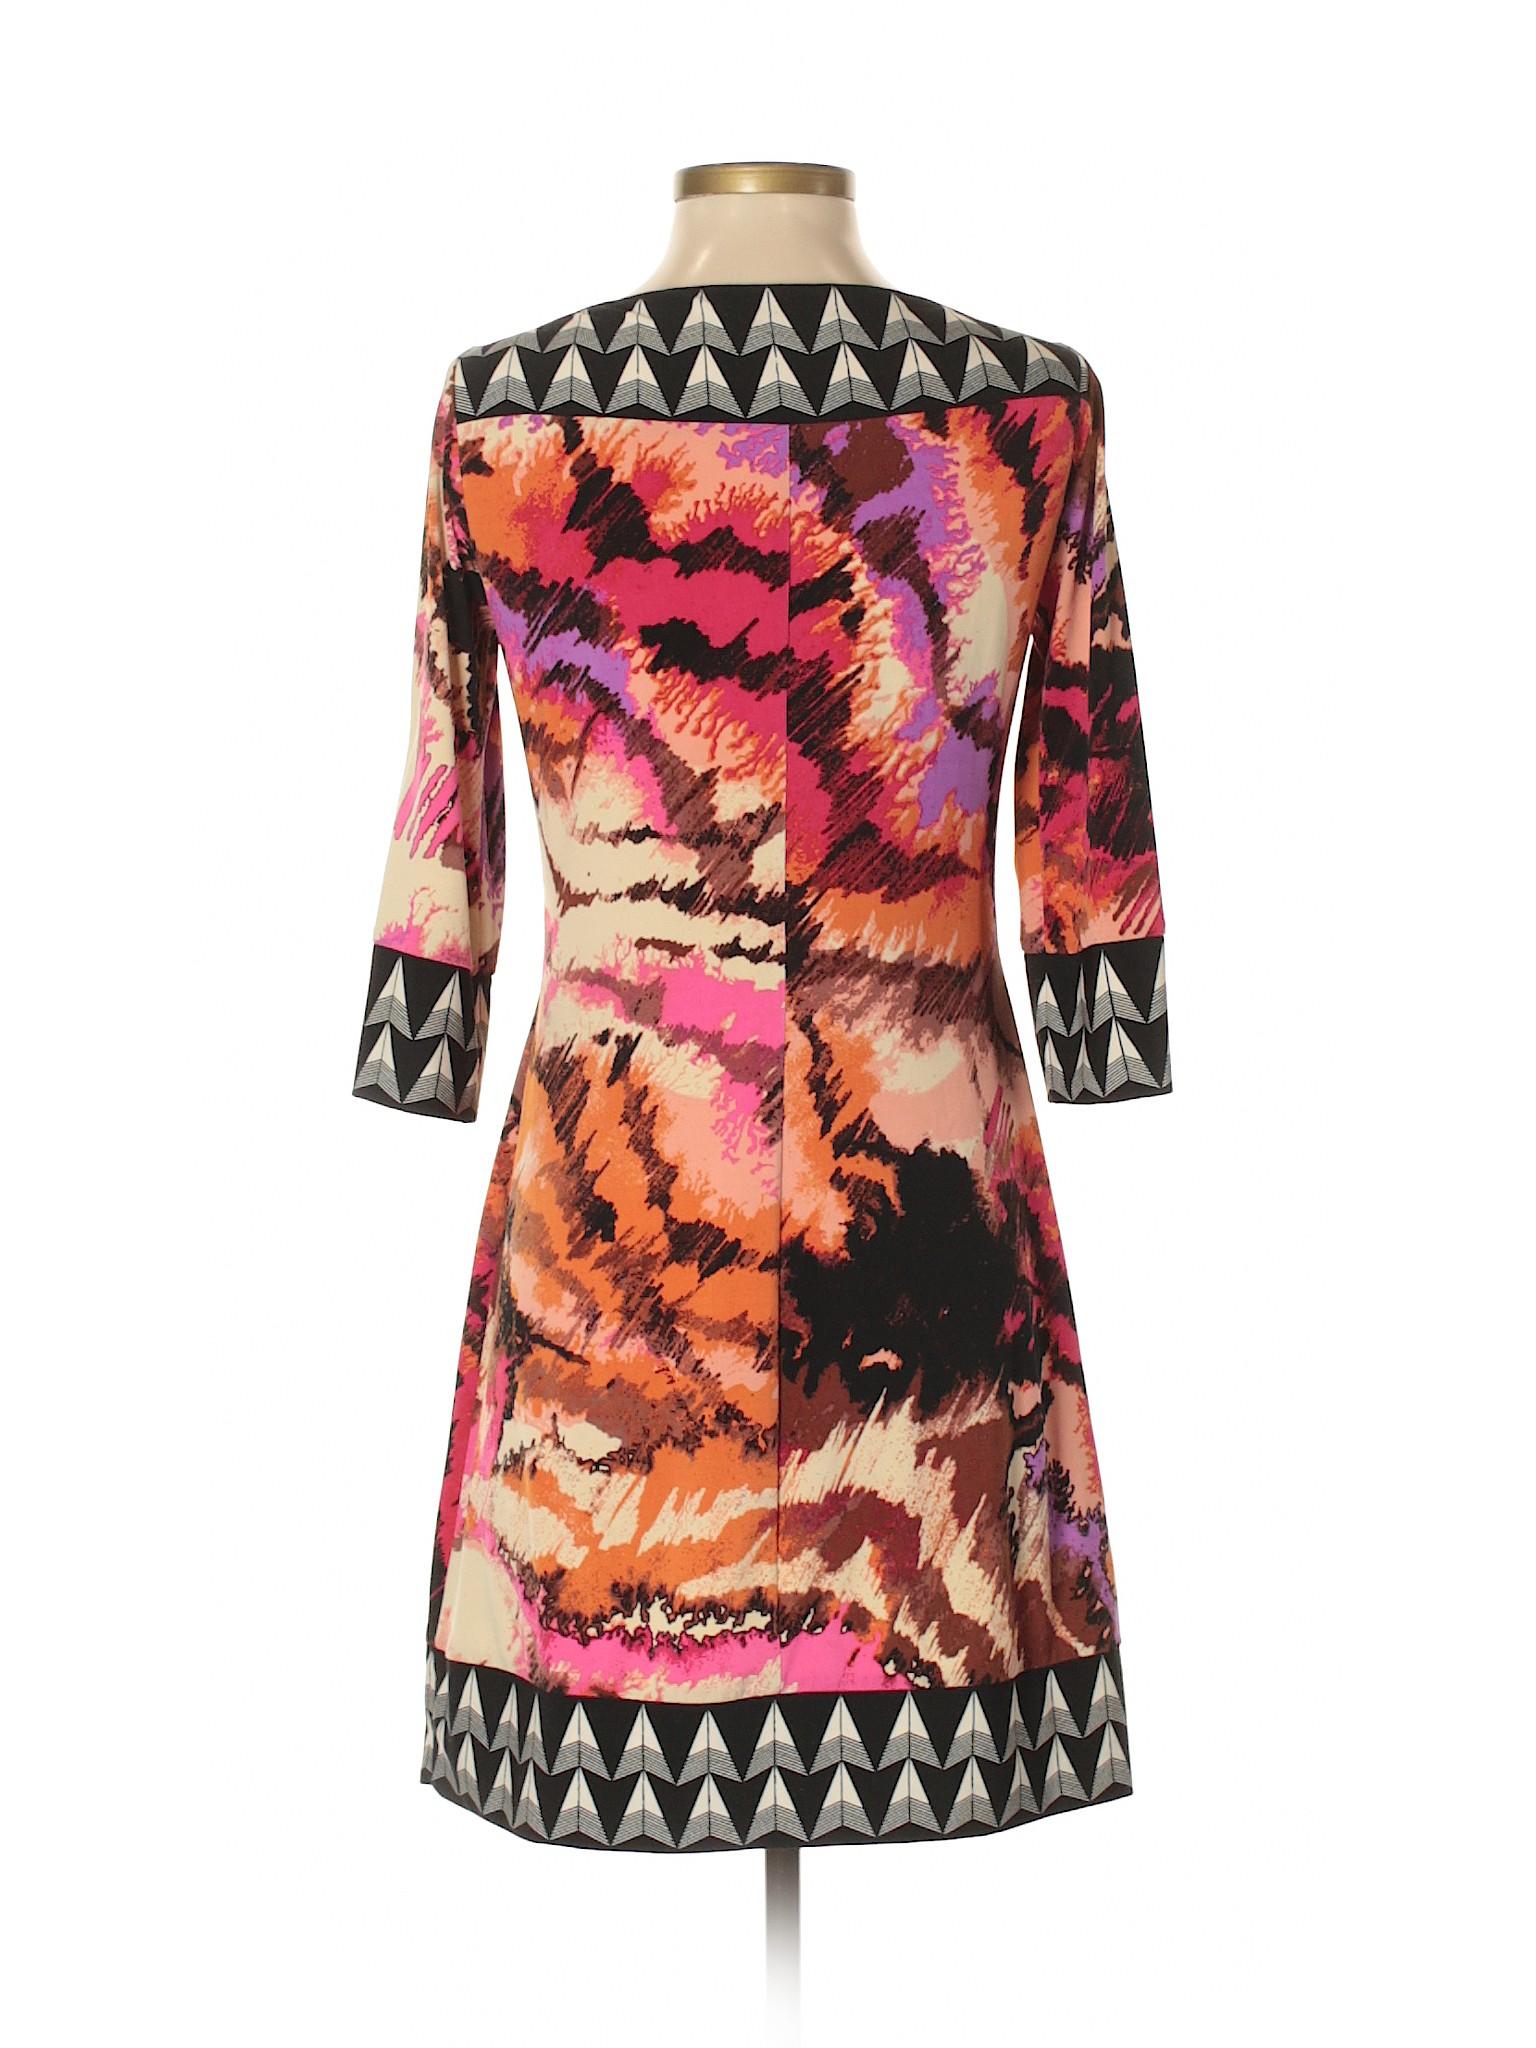 Dress Casual Boutique Boutique winter Chequer winter wvTwXq1